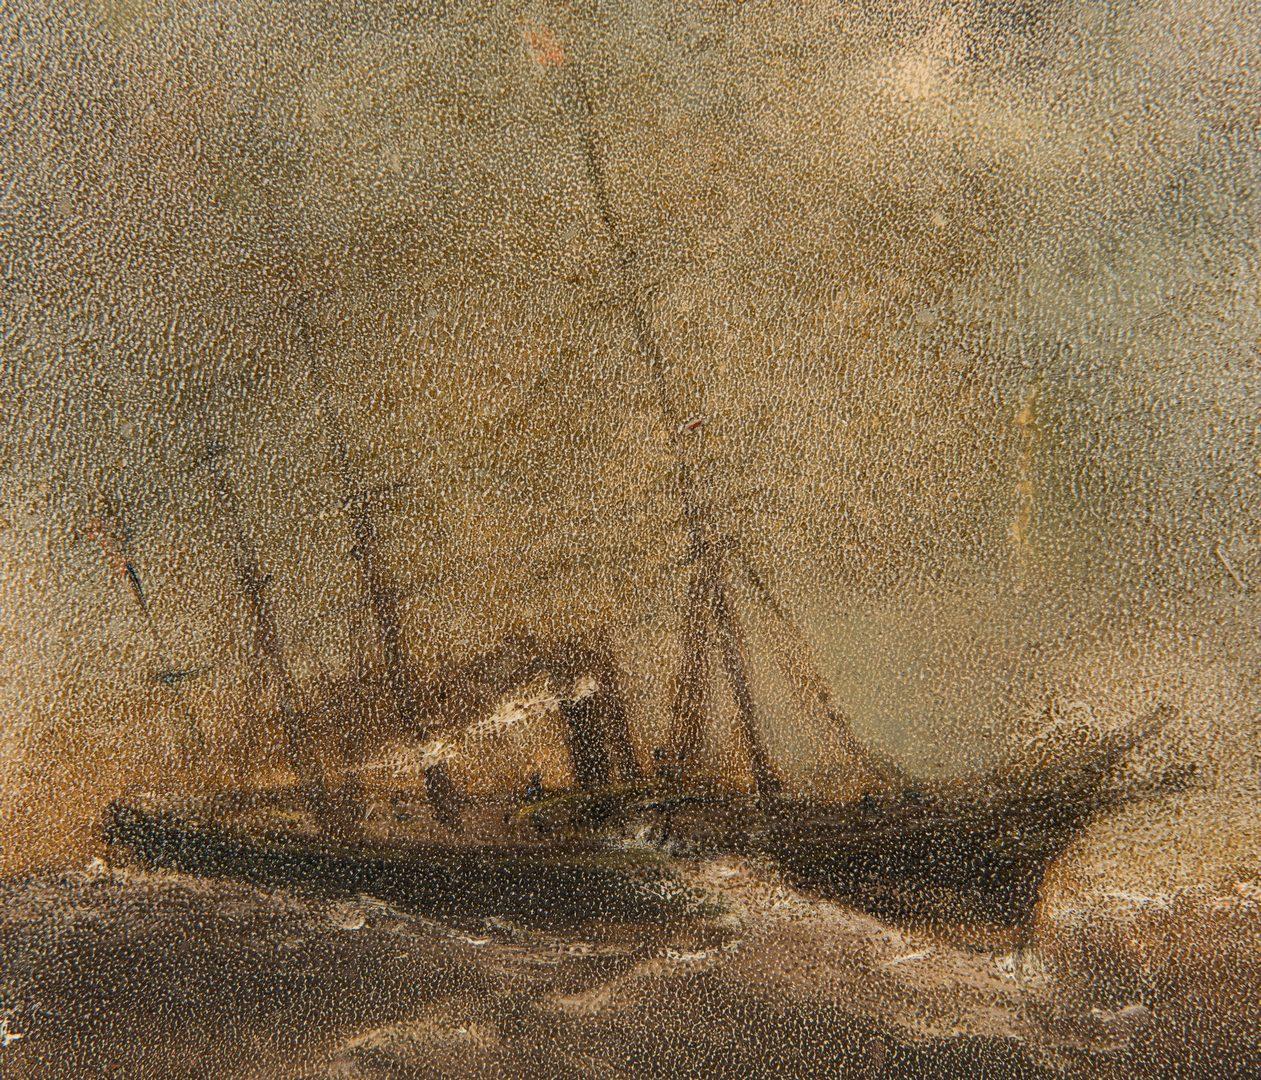 Lot 728: 2 English Marine Paintings